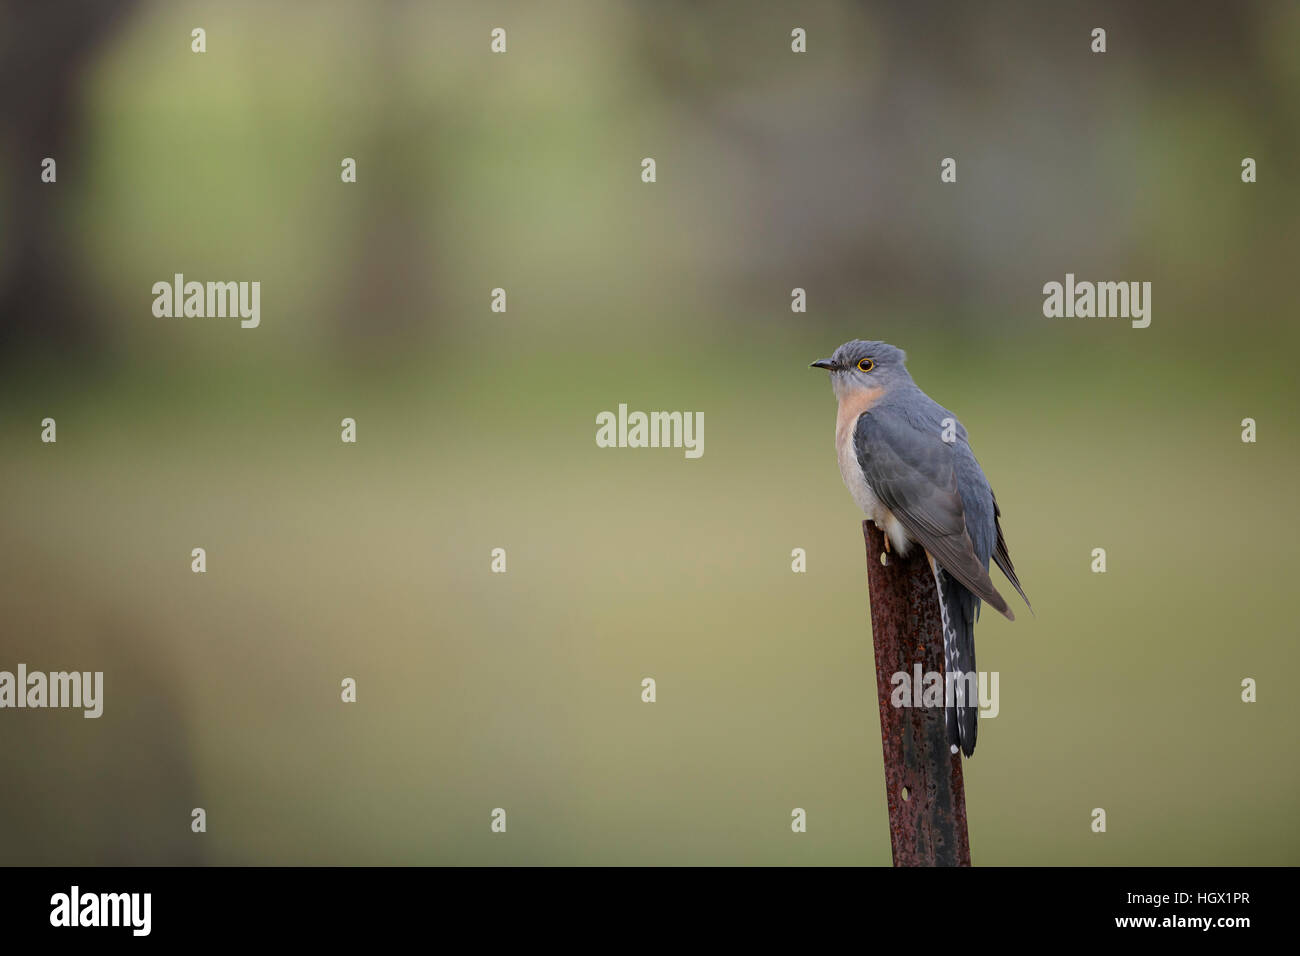 Fan Tailed Cuckoo (cacomantis flabelliformis) - Australia - Stock Image